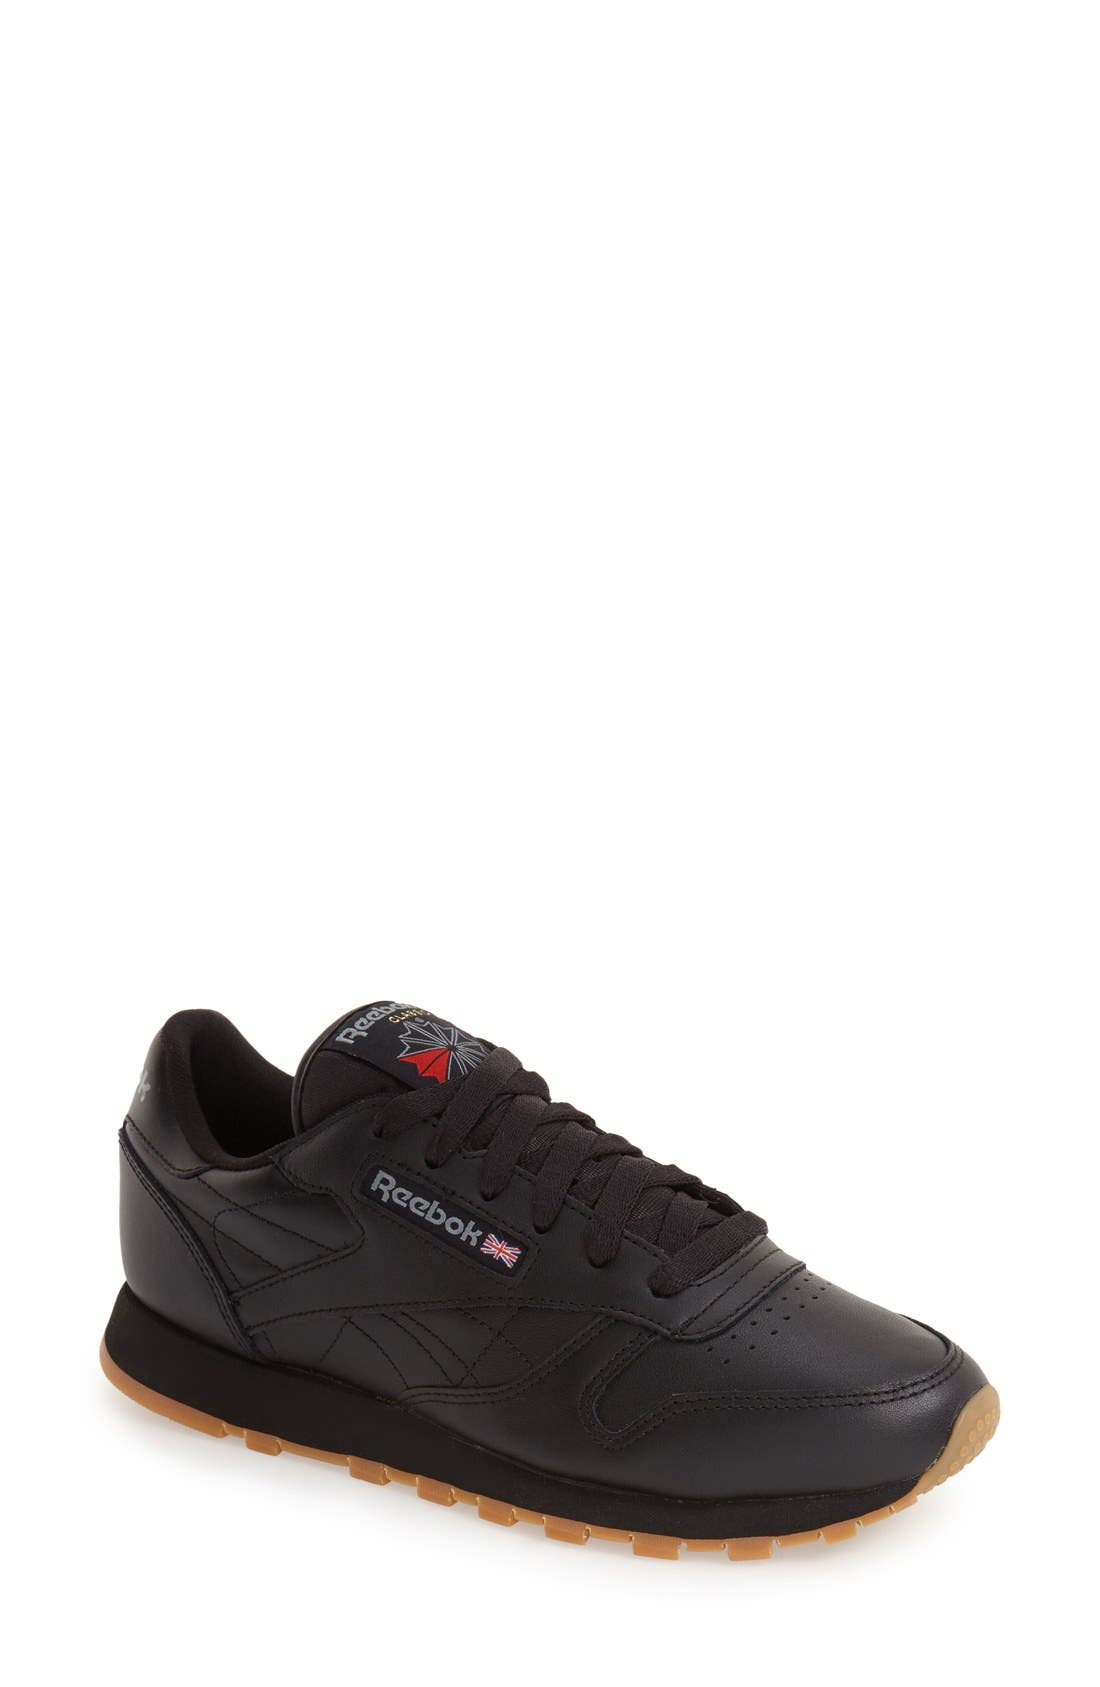 Reebok Classic Leather Sneaker- Black